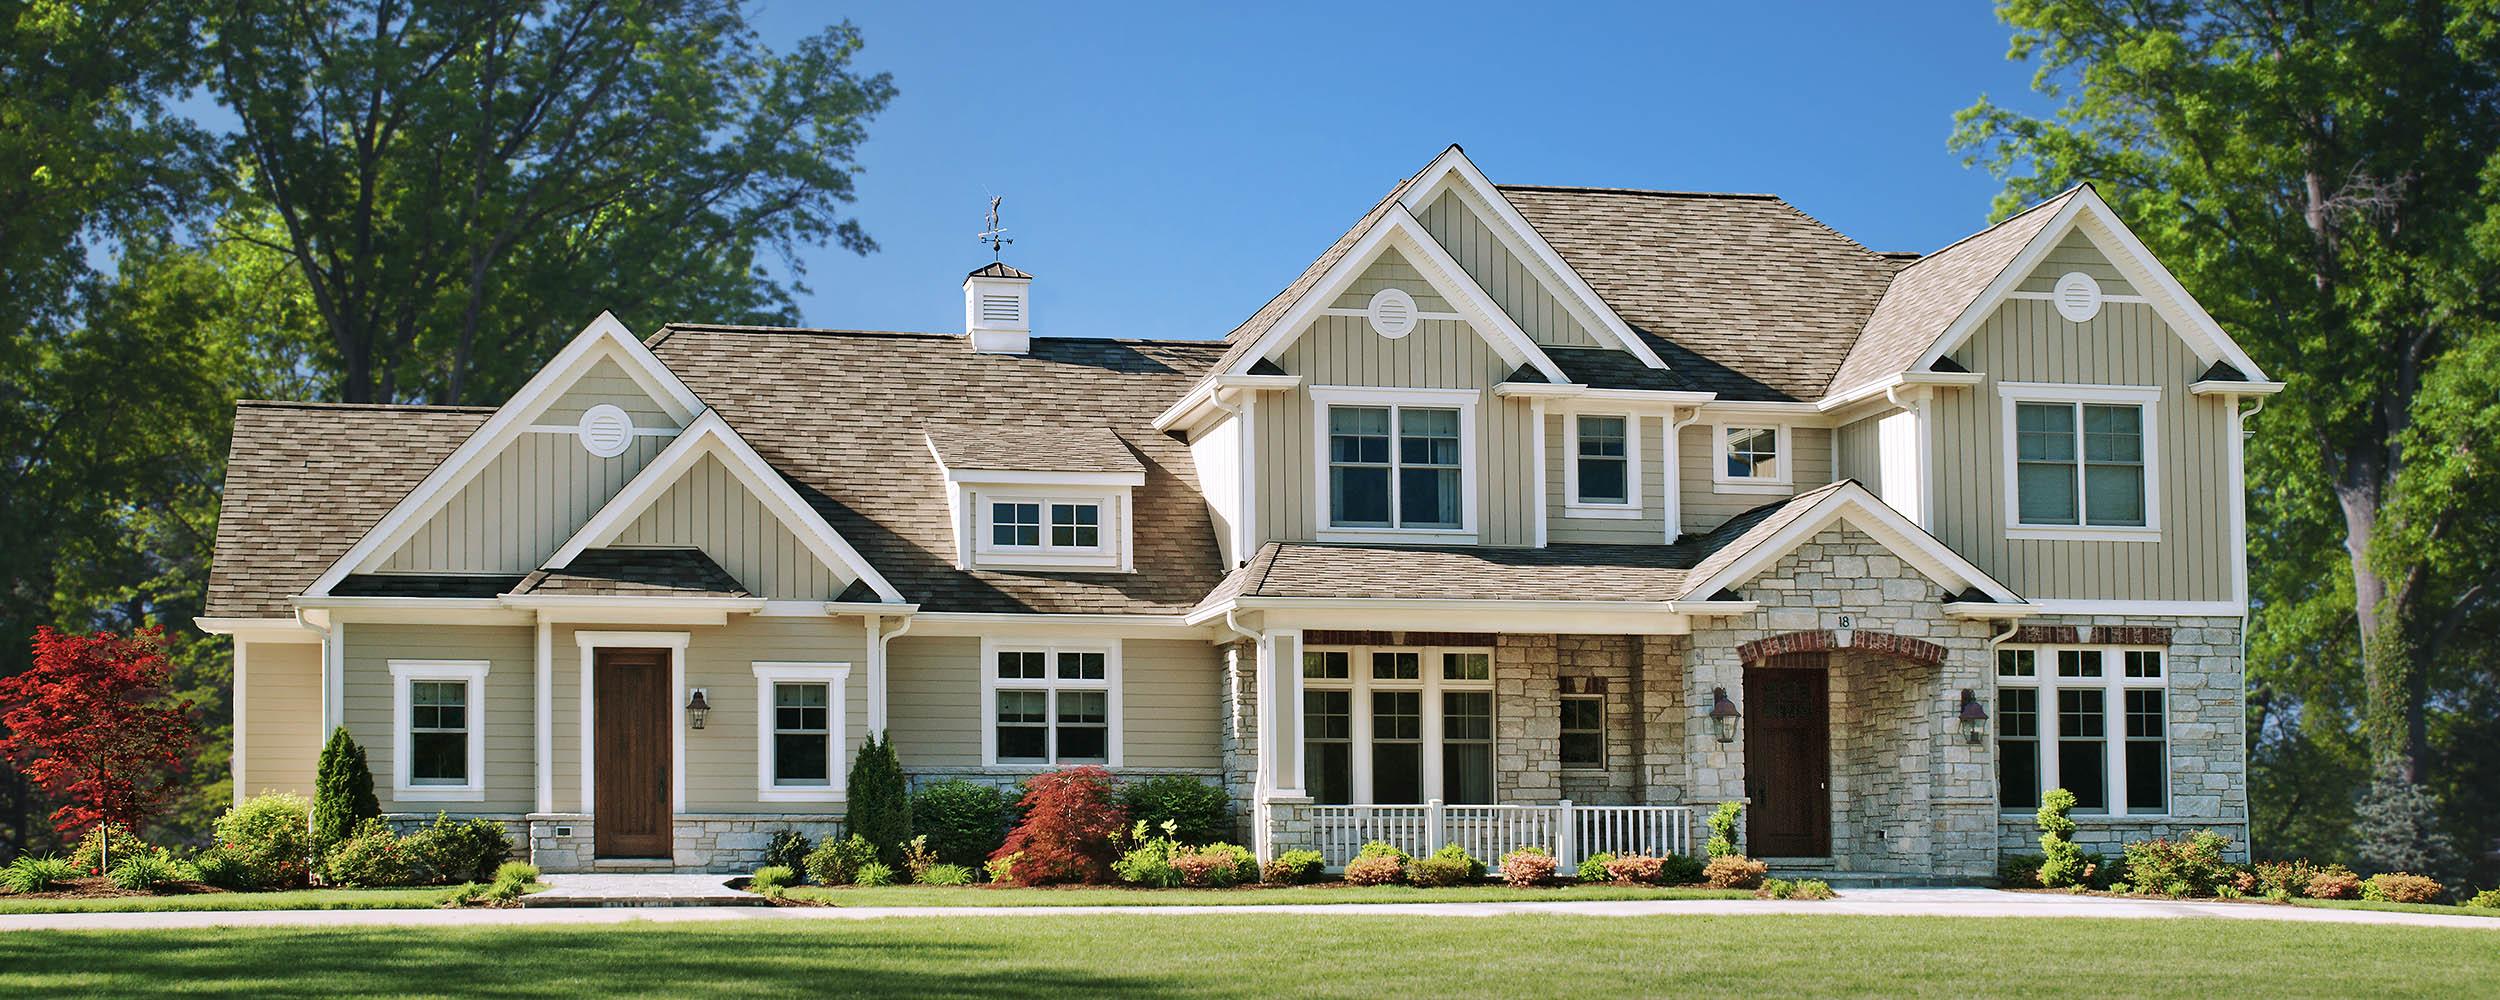 001-AFP-New-Custom-Luxury-Home